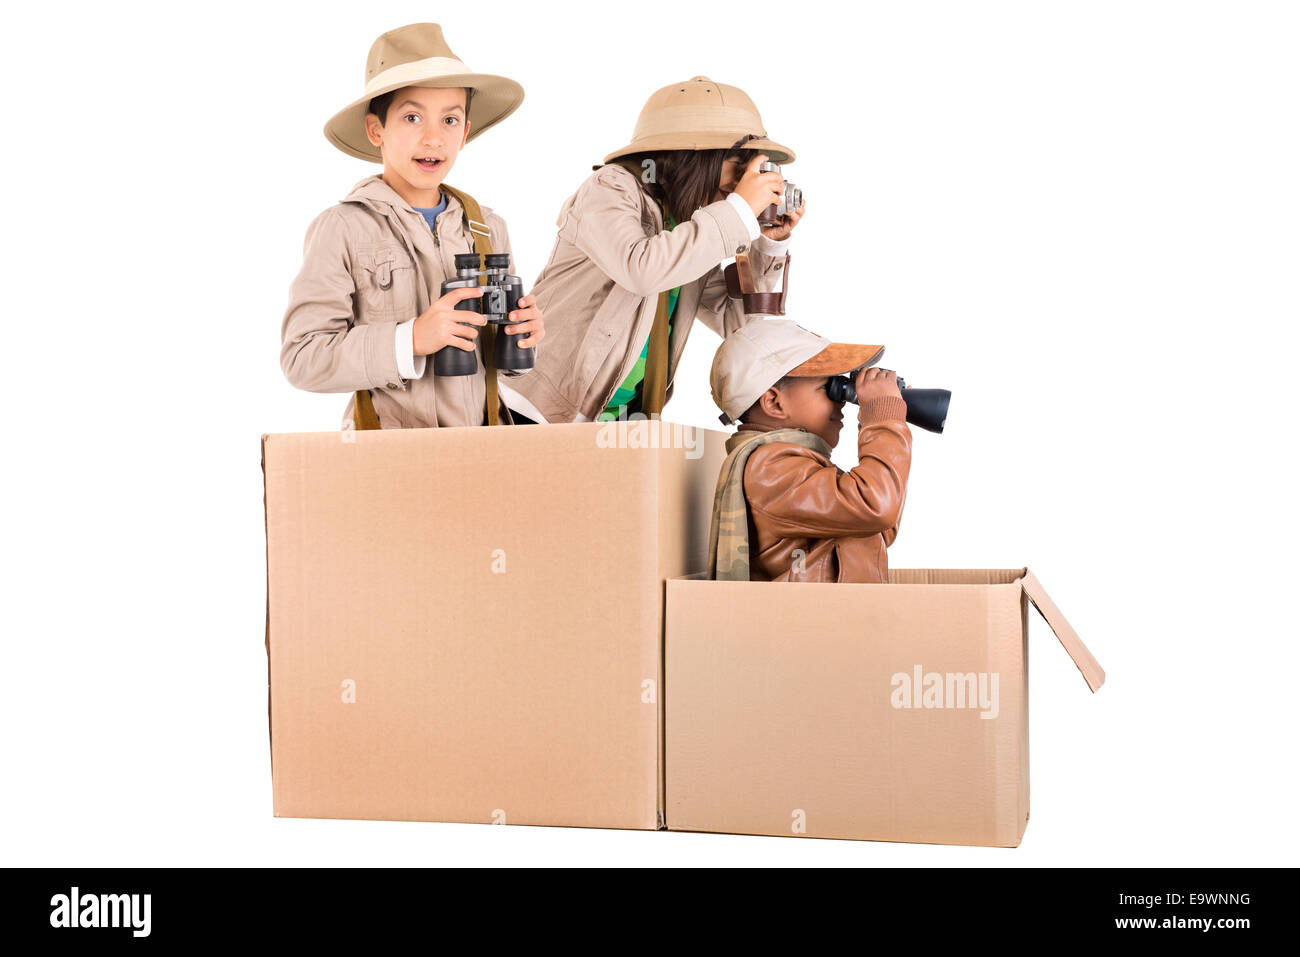 Children's group in a cardboard box playing safari - Stock Image